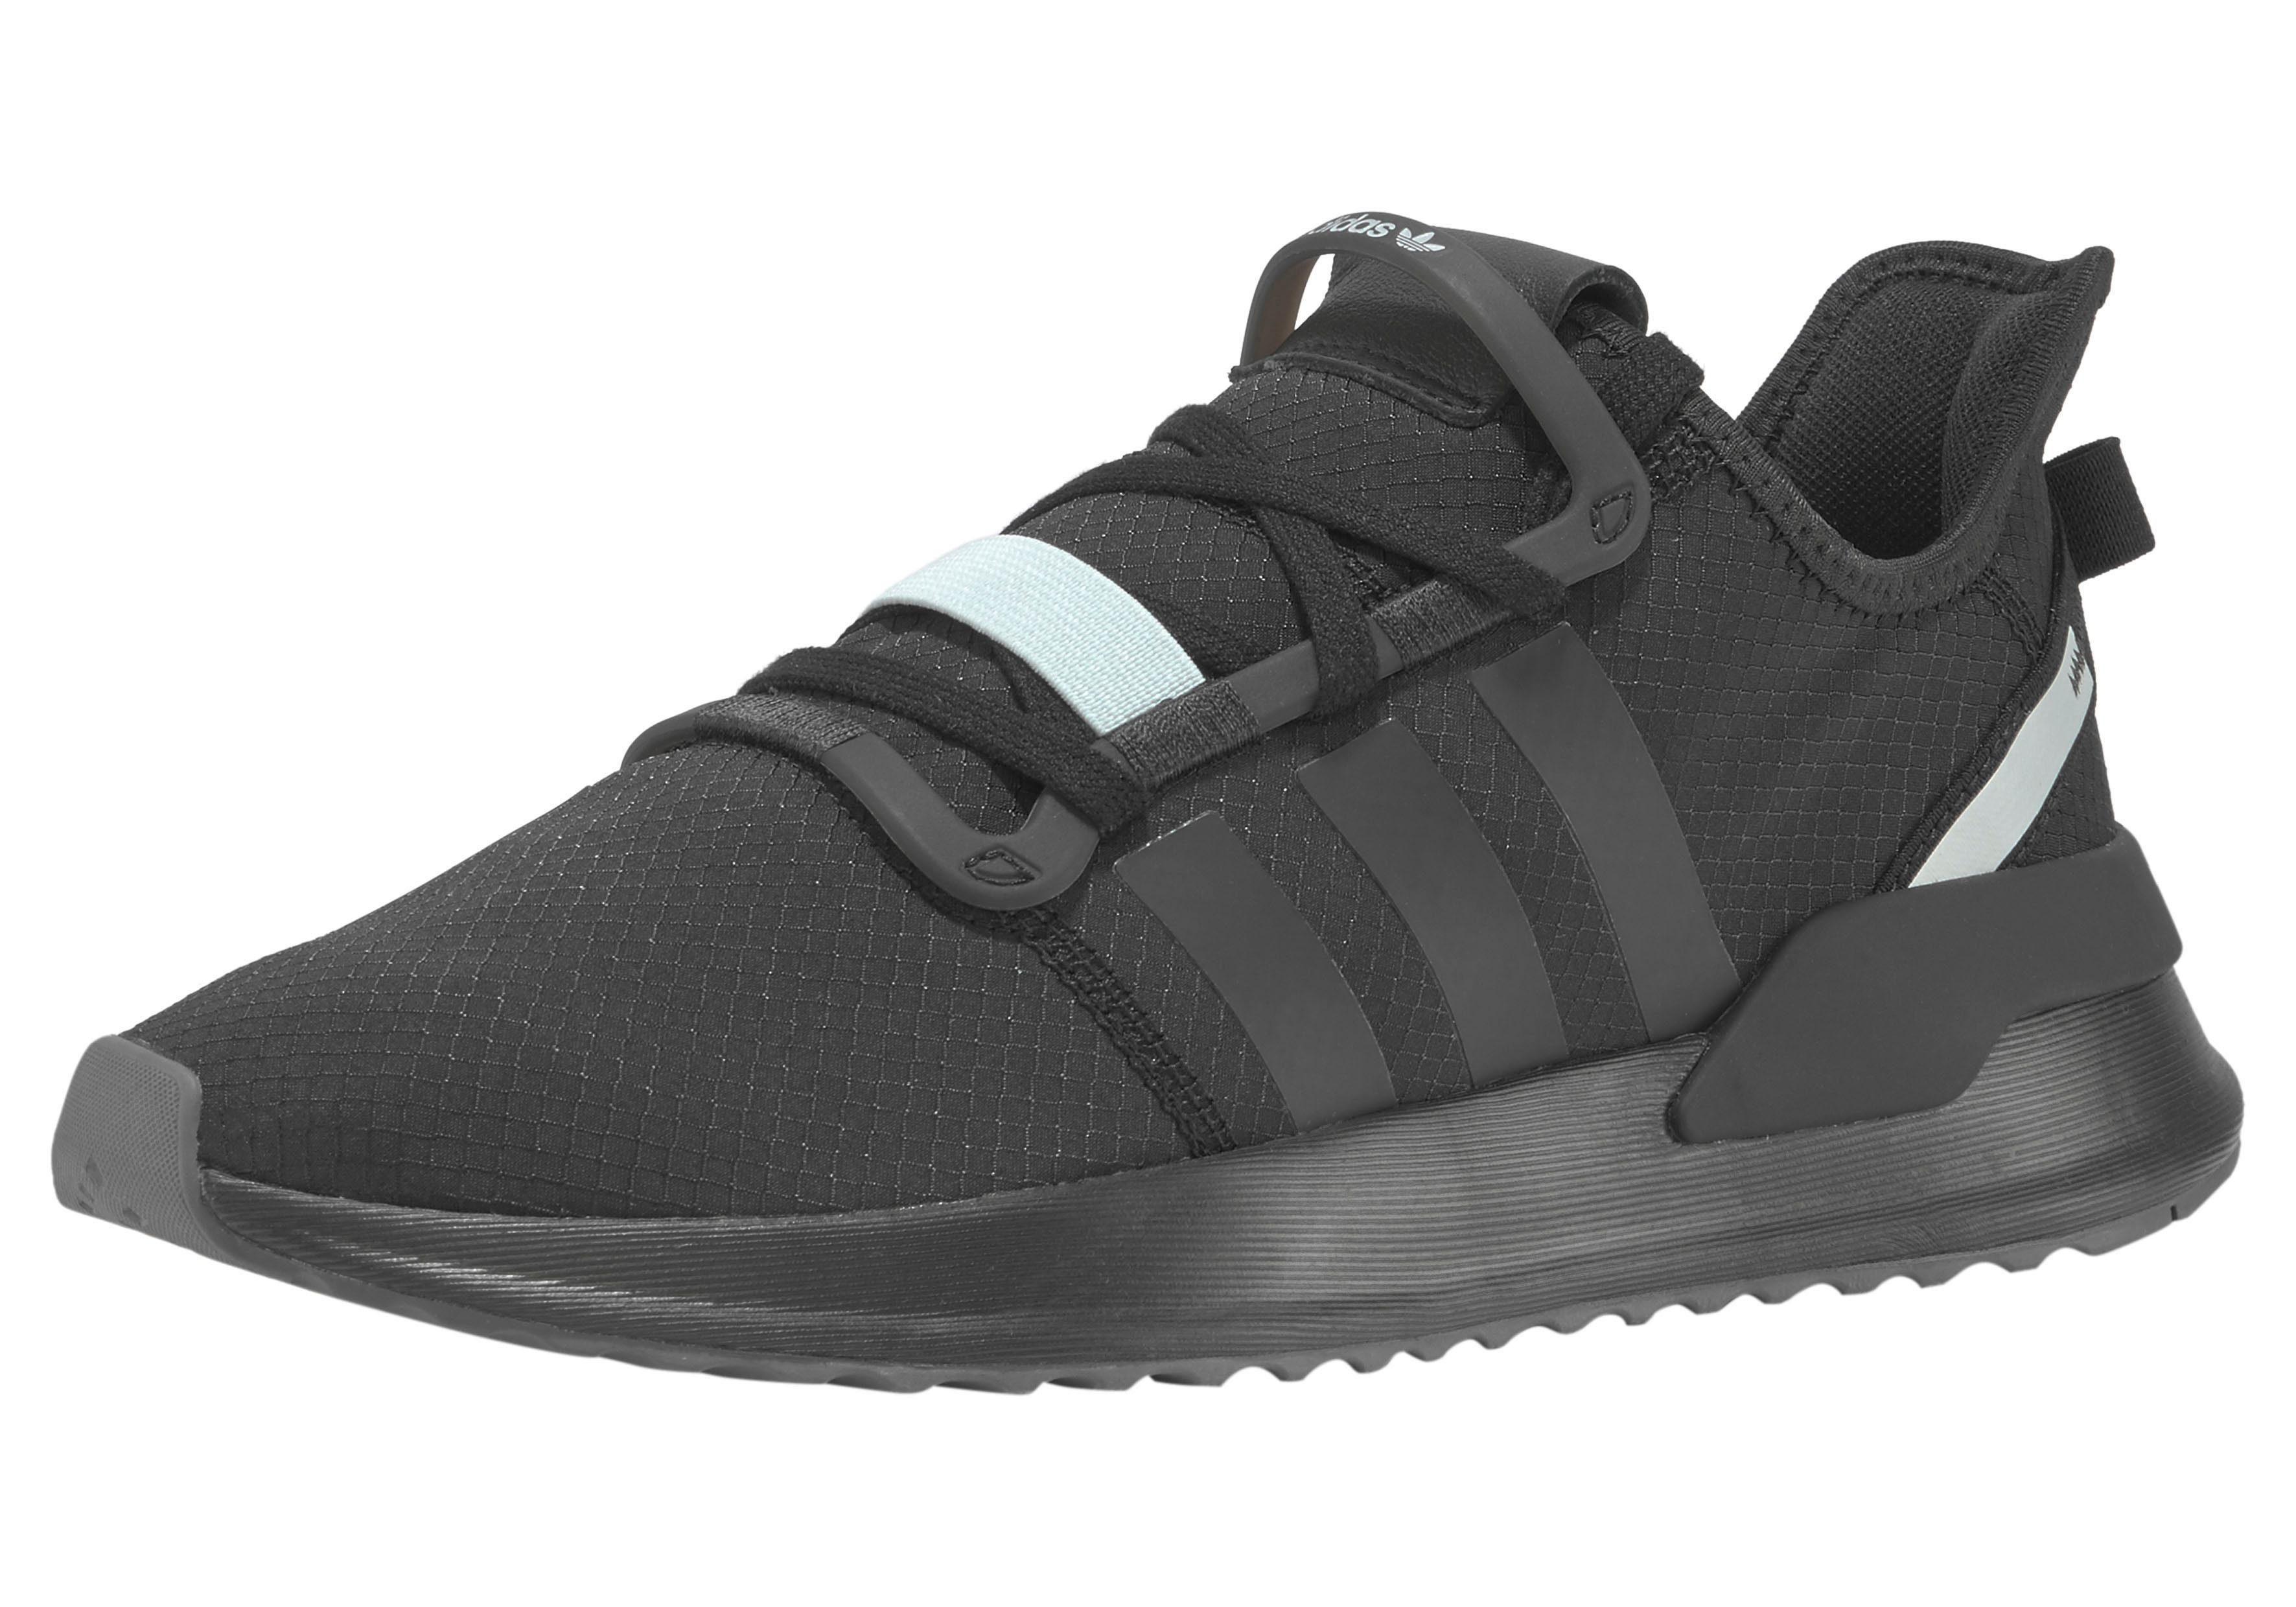 adidas Originals »U_PATH RUN« Sneaker, Sportlicher Sneaker von adidas Originals online kaufen   OTTO